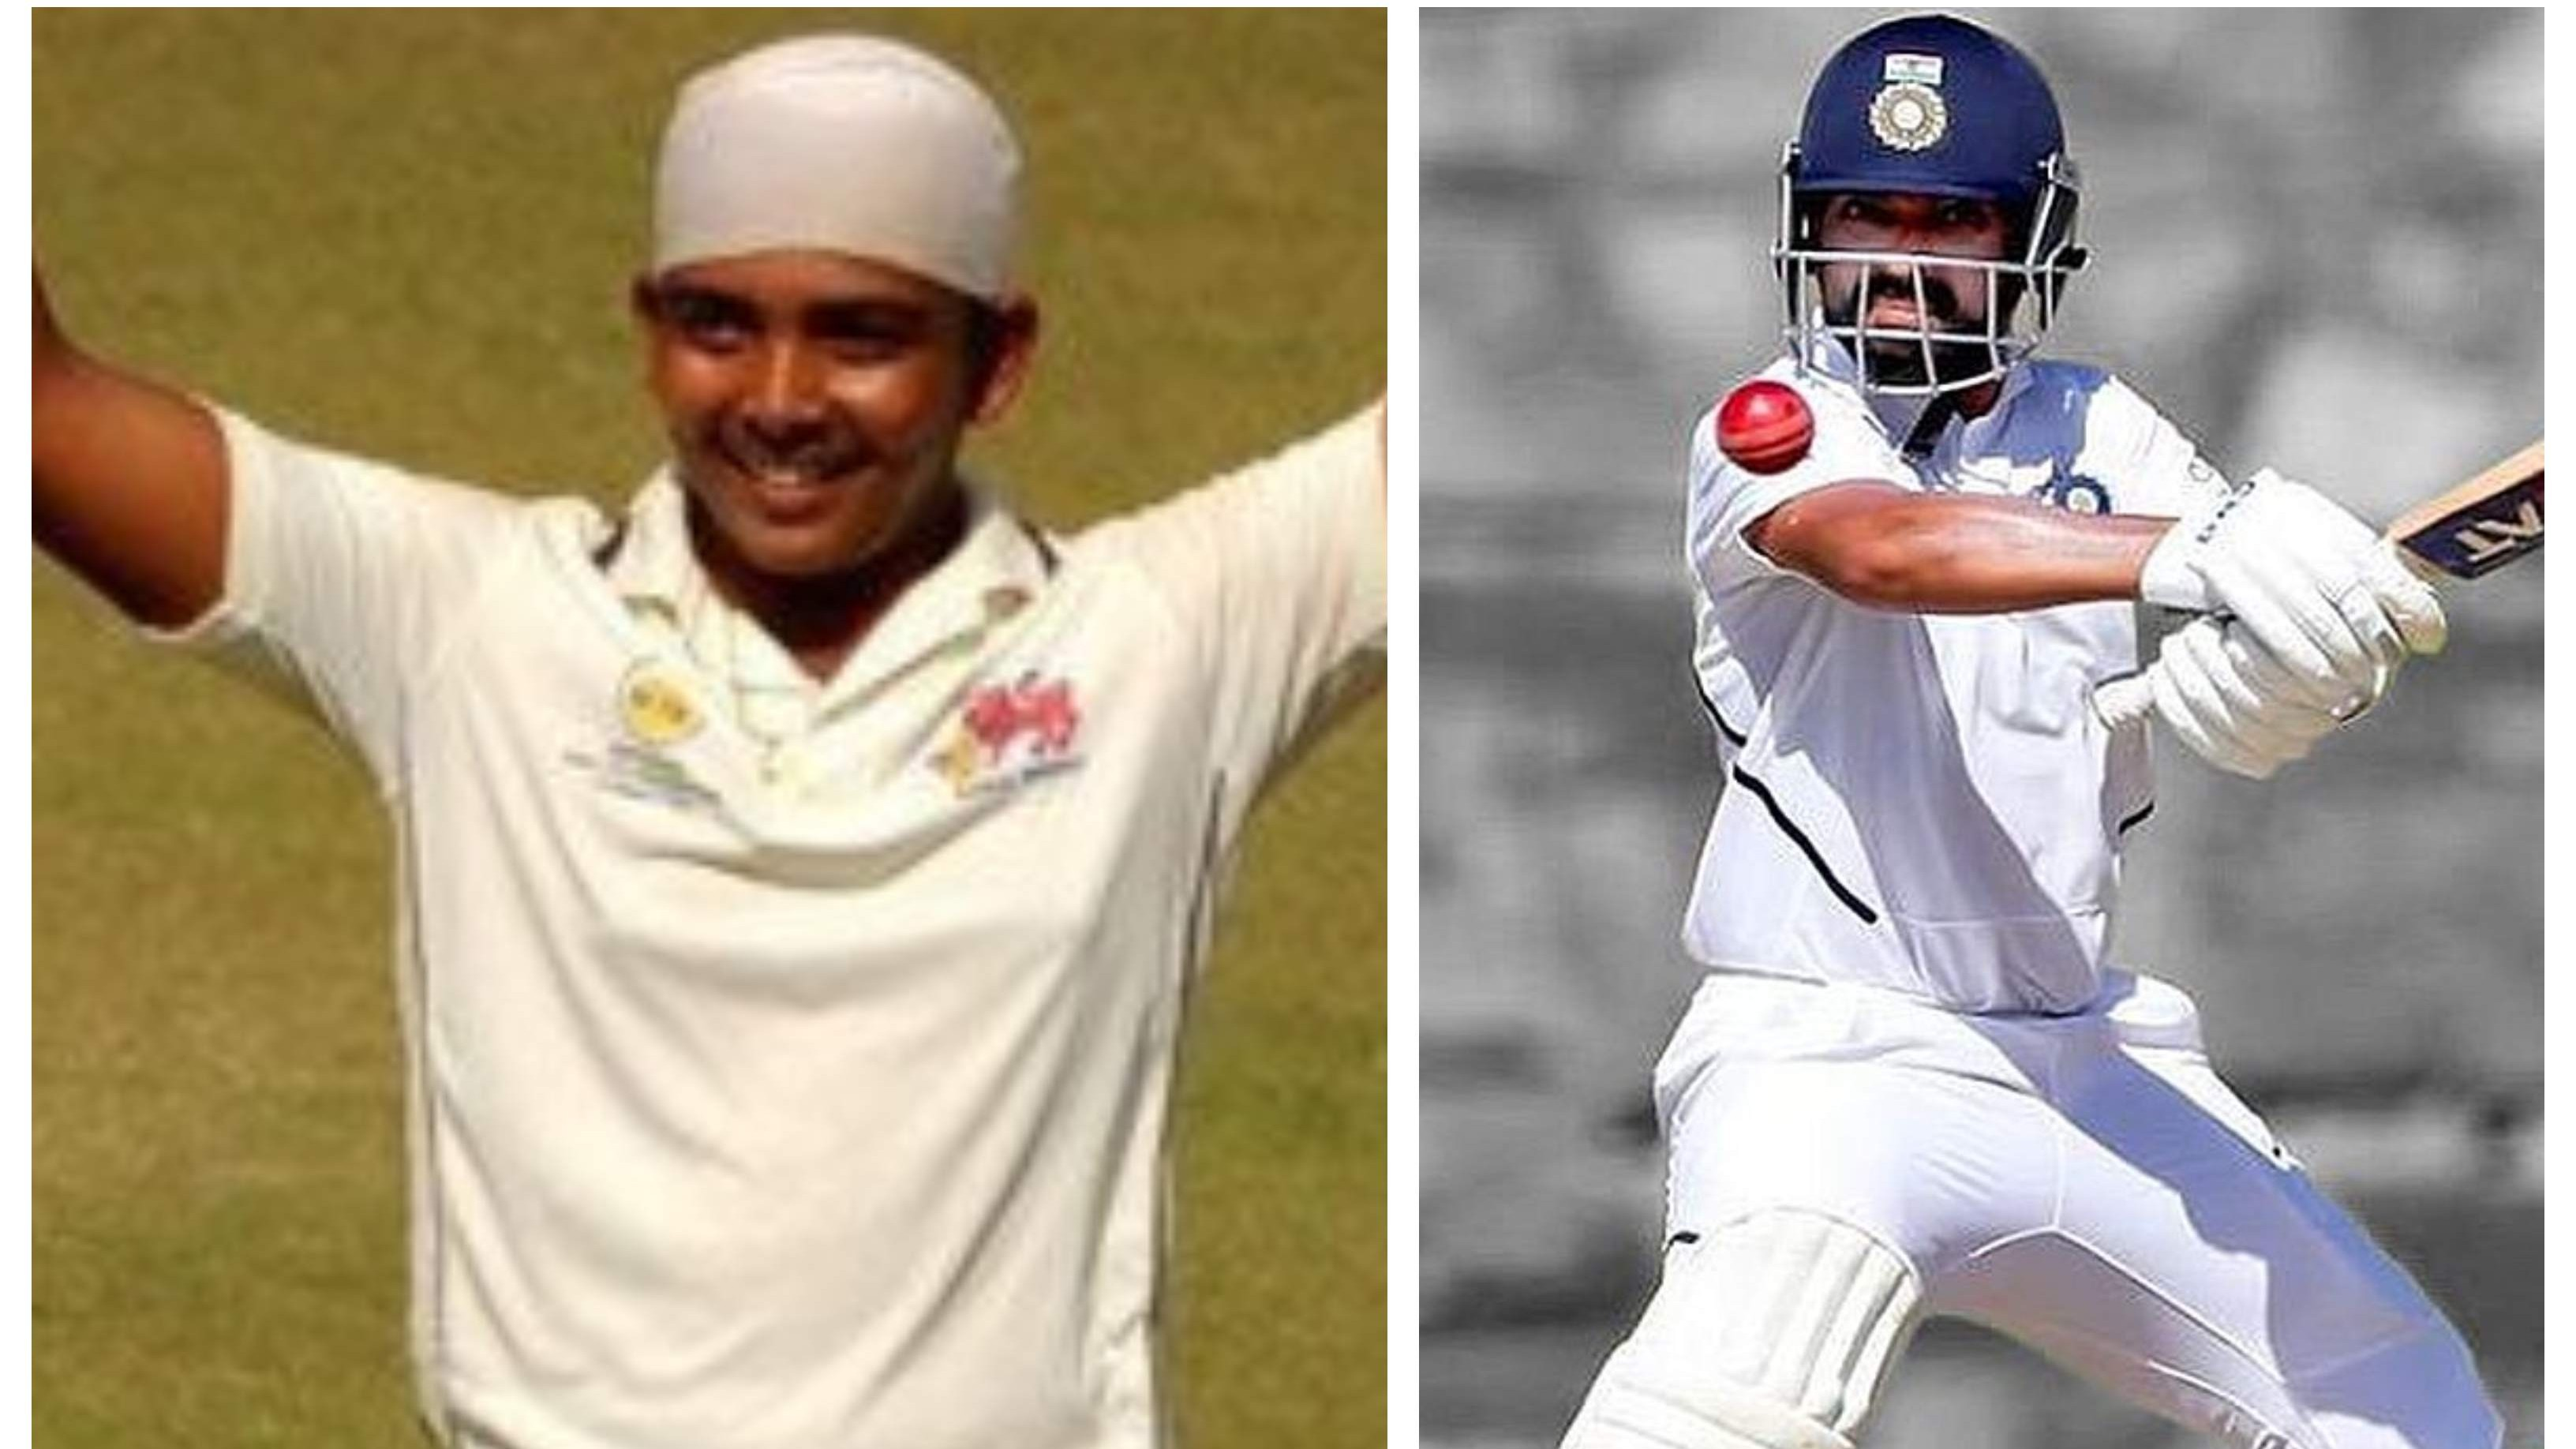 Ranji Trophy 2019-20: Shaw, Rahane slam fifties as Mumbai post 362/8 on Day 1 versus Baroda